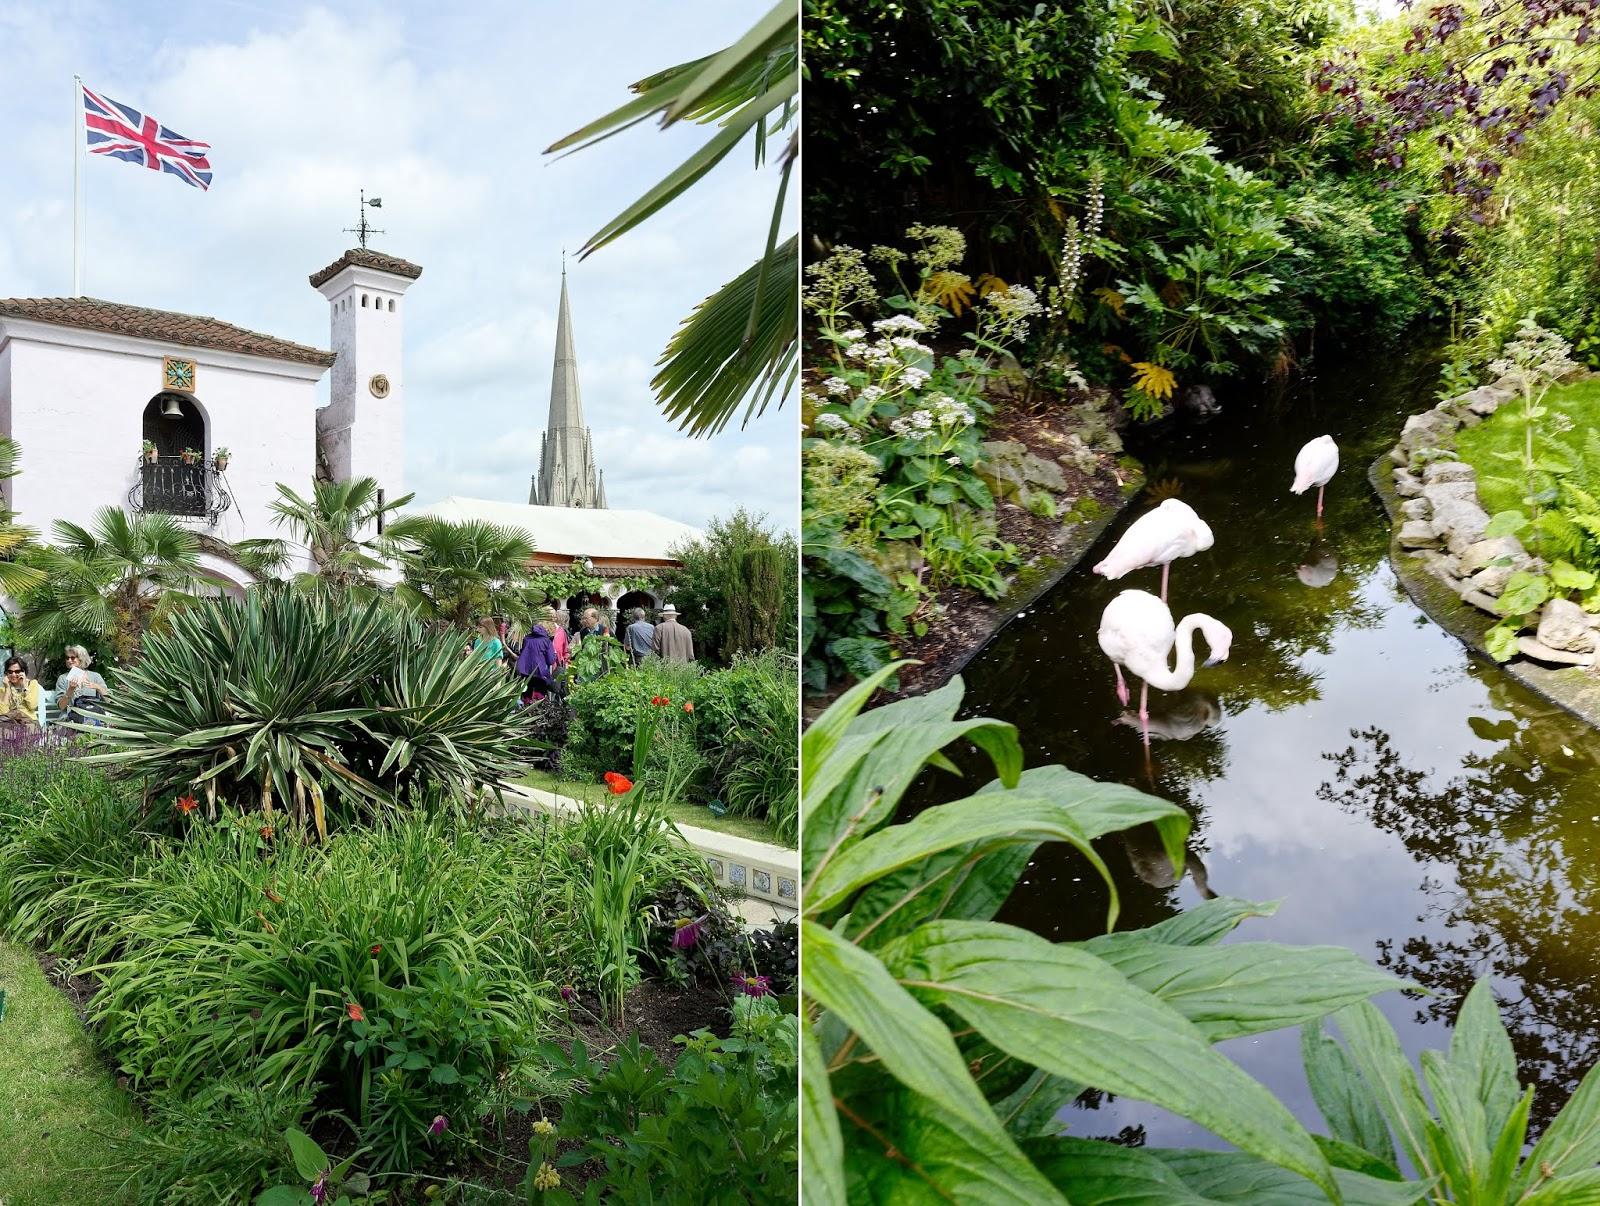 Open Garden Squares London - Roof Garden